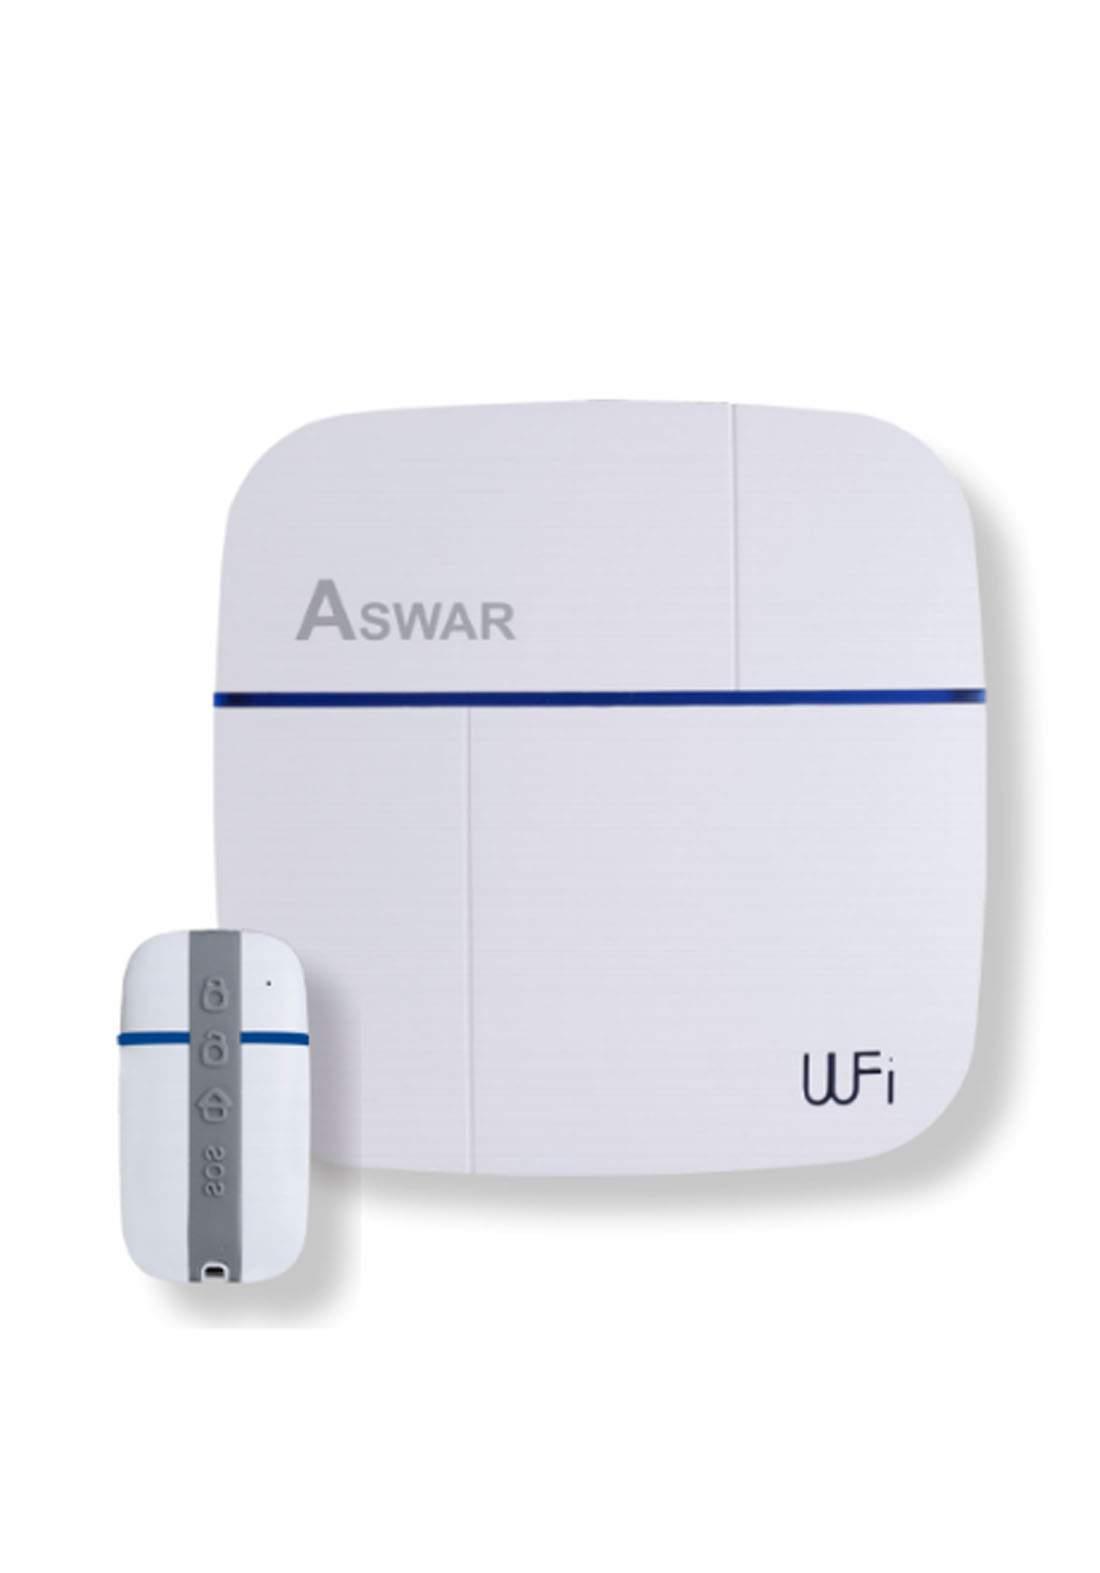 Aswar AS-HSS2-PANEL WiFi & GSM Smart Alarm Panel - White جهاز تنبيه داخلي للمنزل